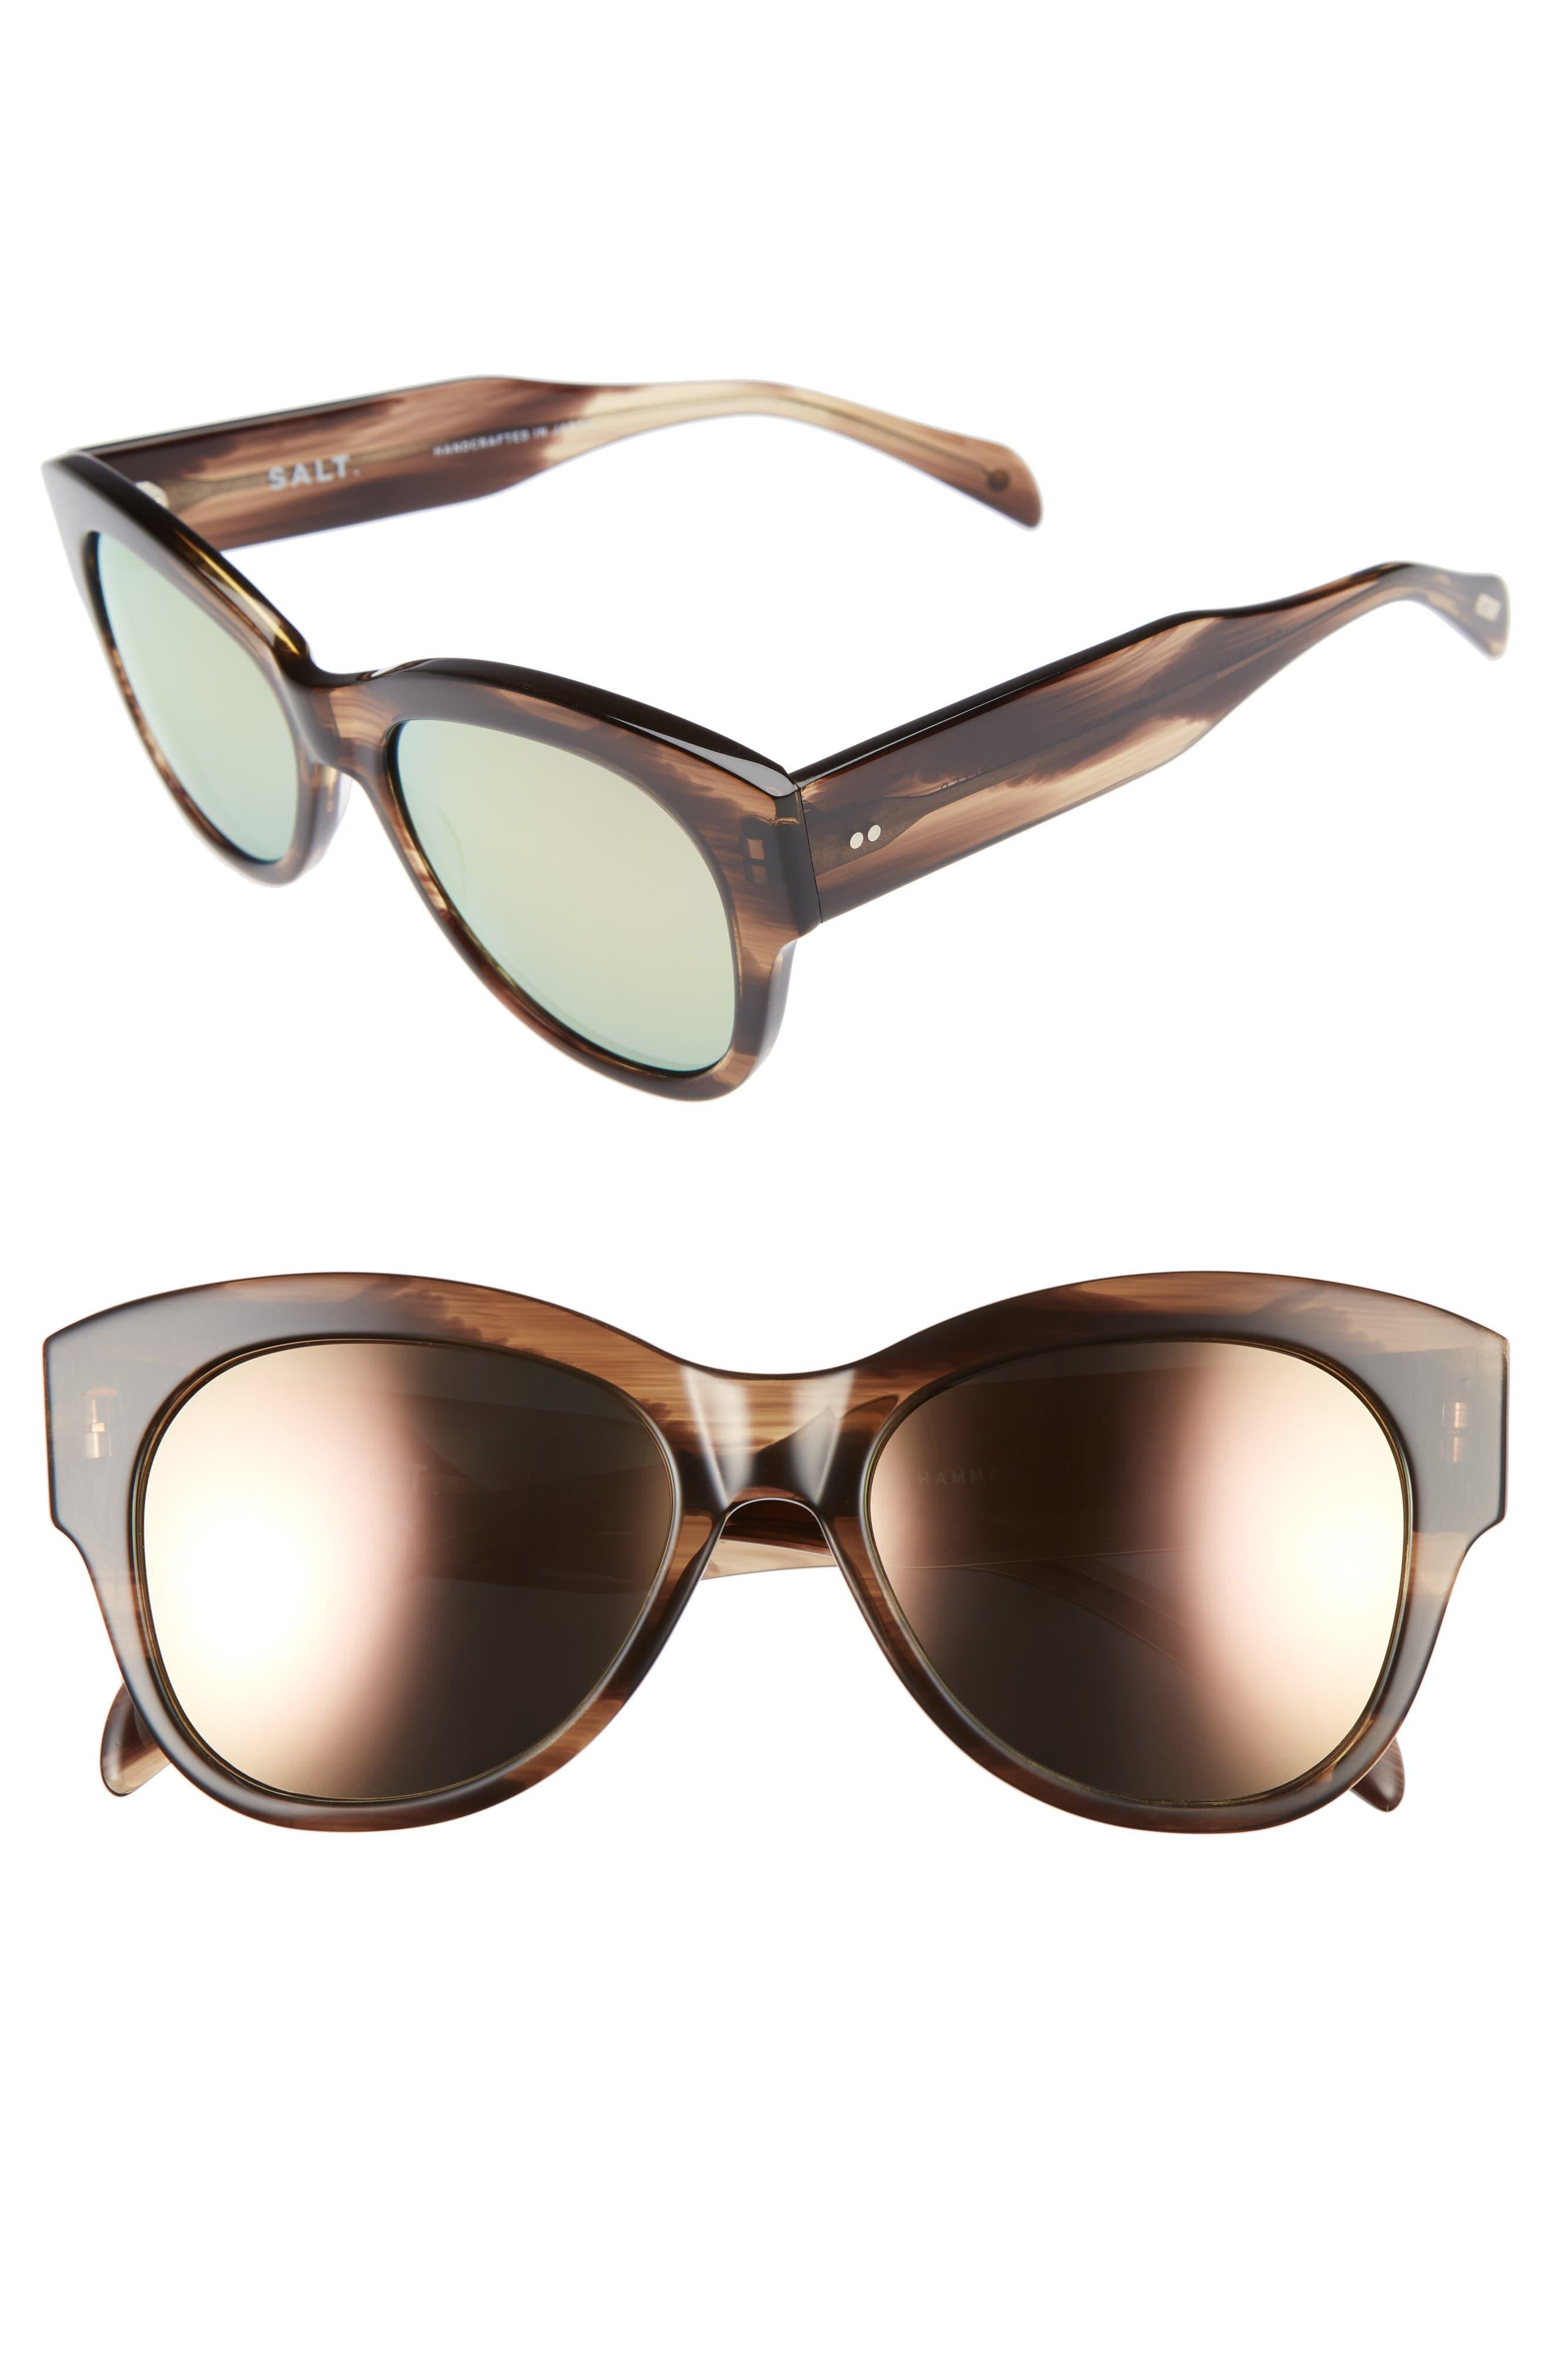 Main Image - SALT Hammen 54mm Polarized Cat Eye Sunglasses